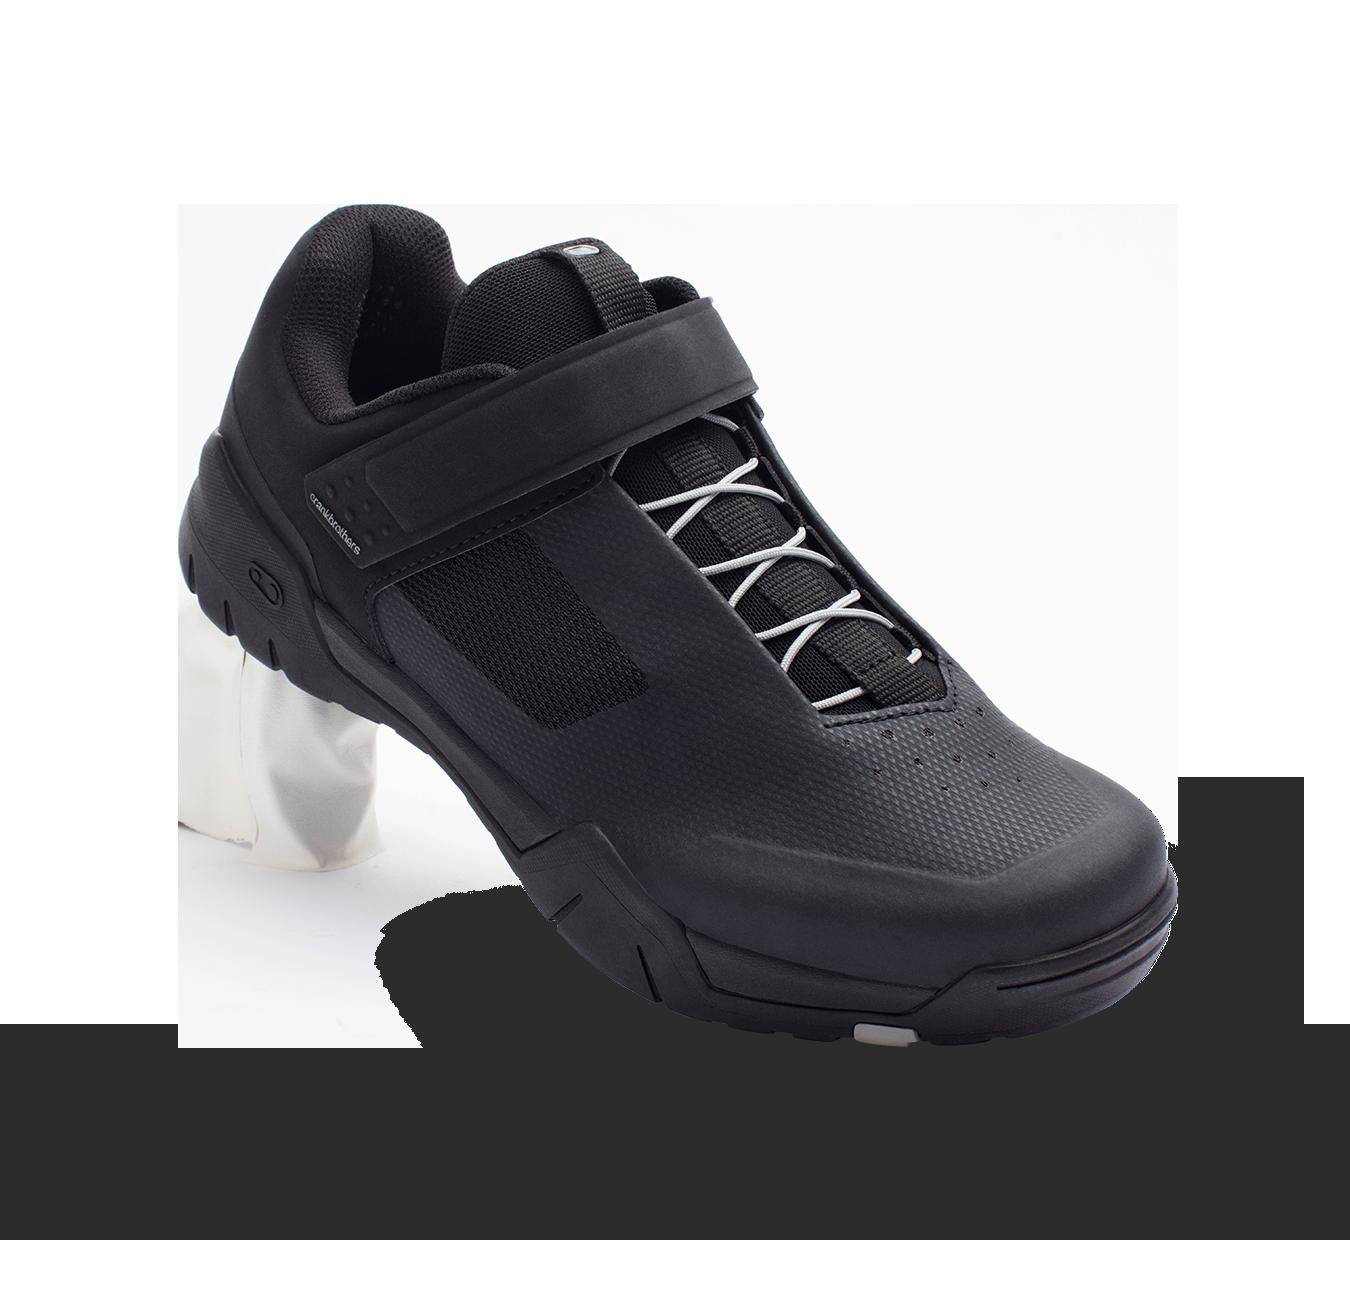 CrankBrothers Mallet E Speedlace Shoe Black/Silver-1